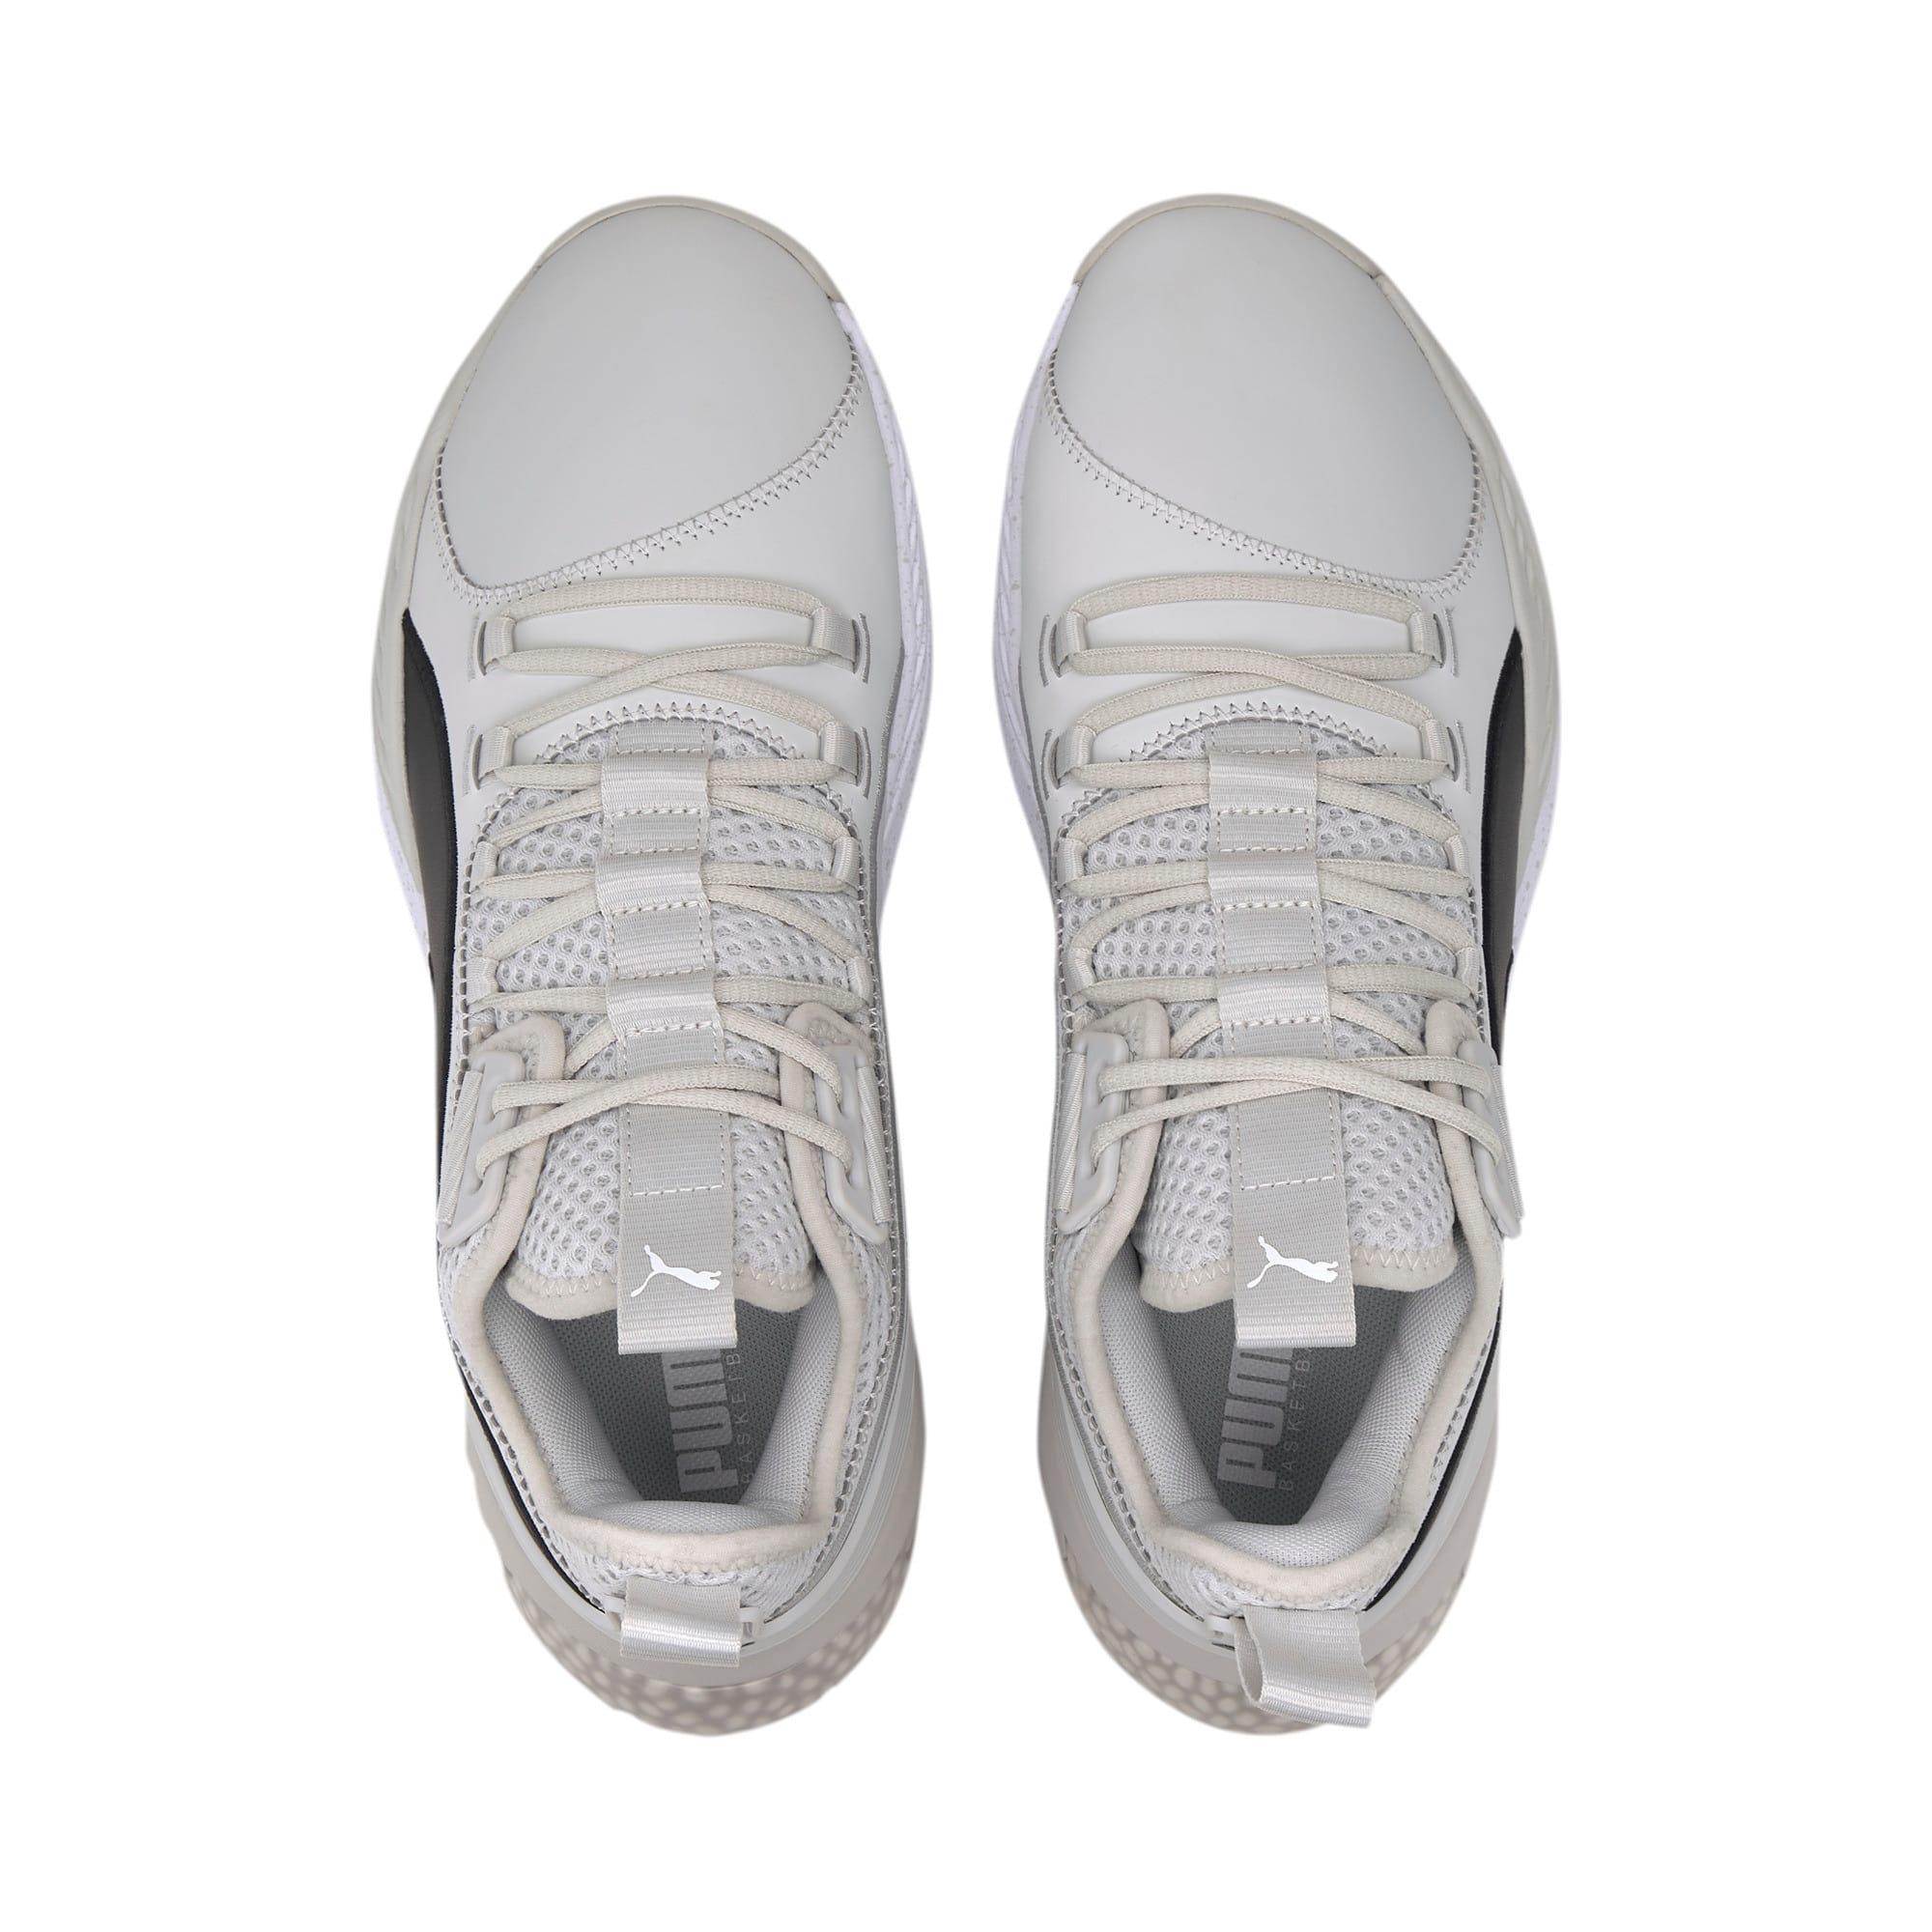 Thumbnail 6 of Uproar Core Men's Basketball Shoes, Glacier Gray, medium